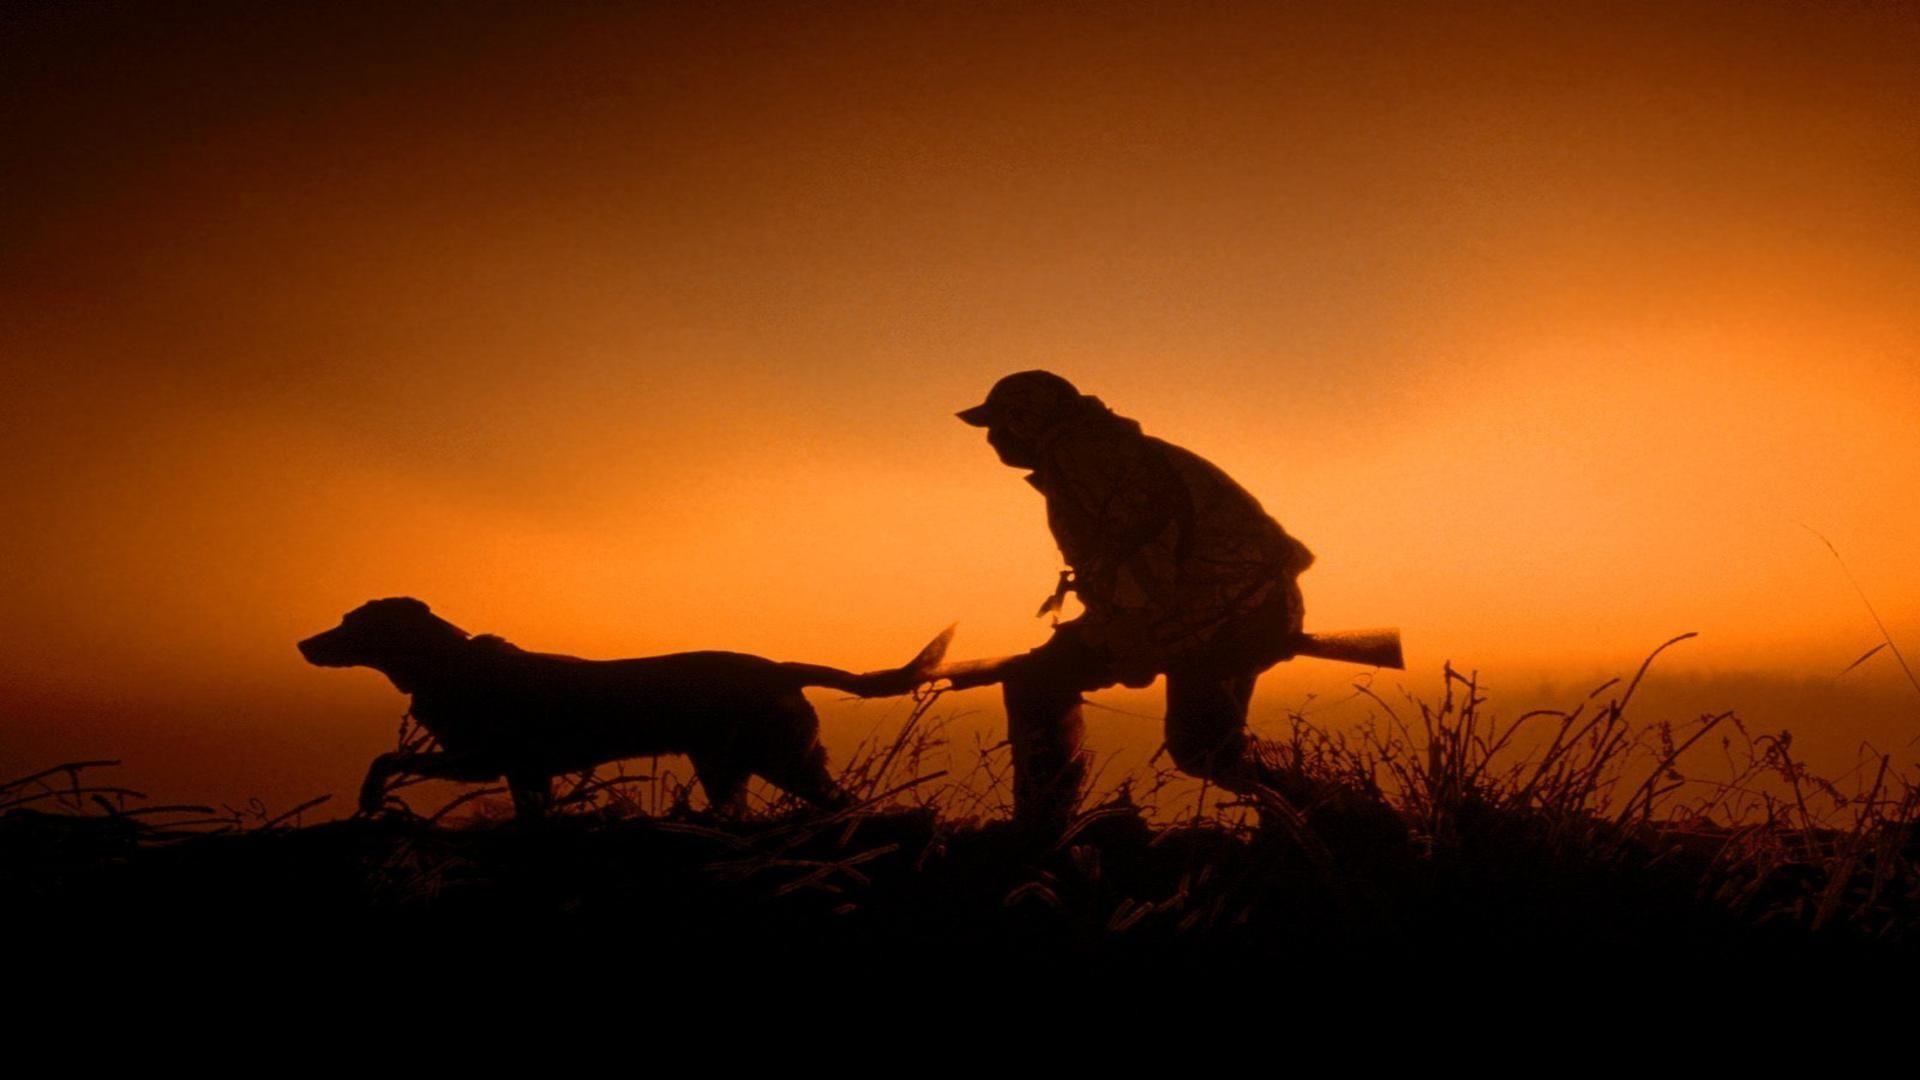 В Тамбовской области продлен запрет на занятия охотой на 18 территориях